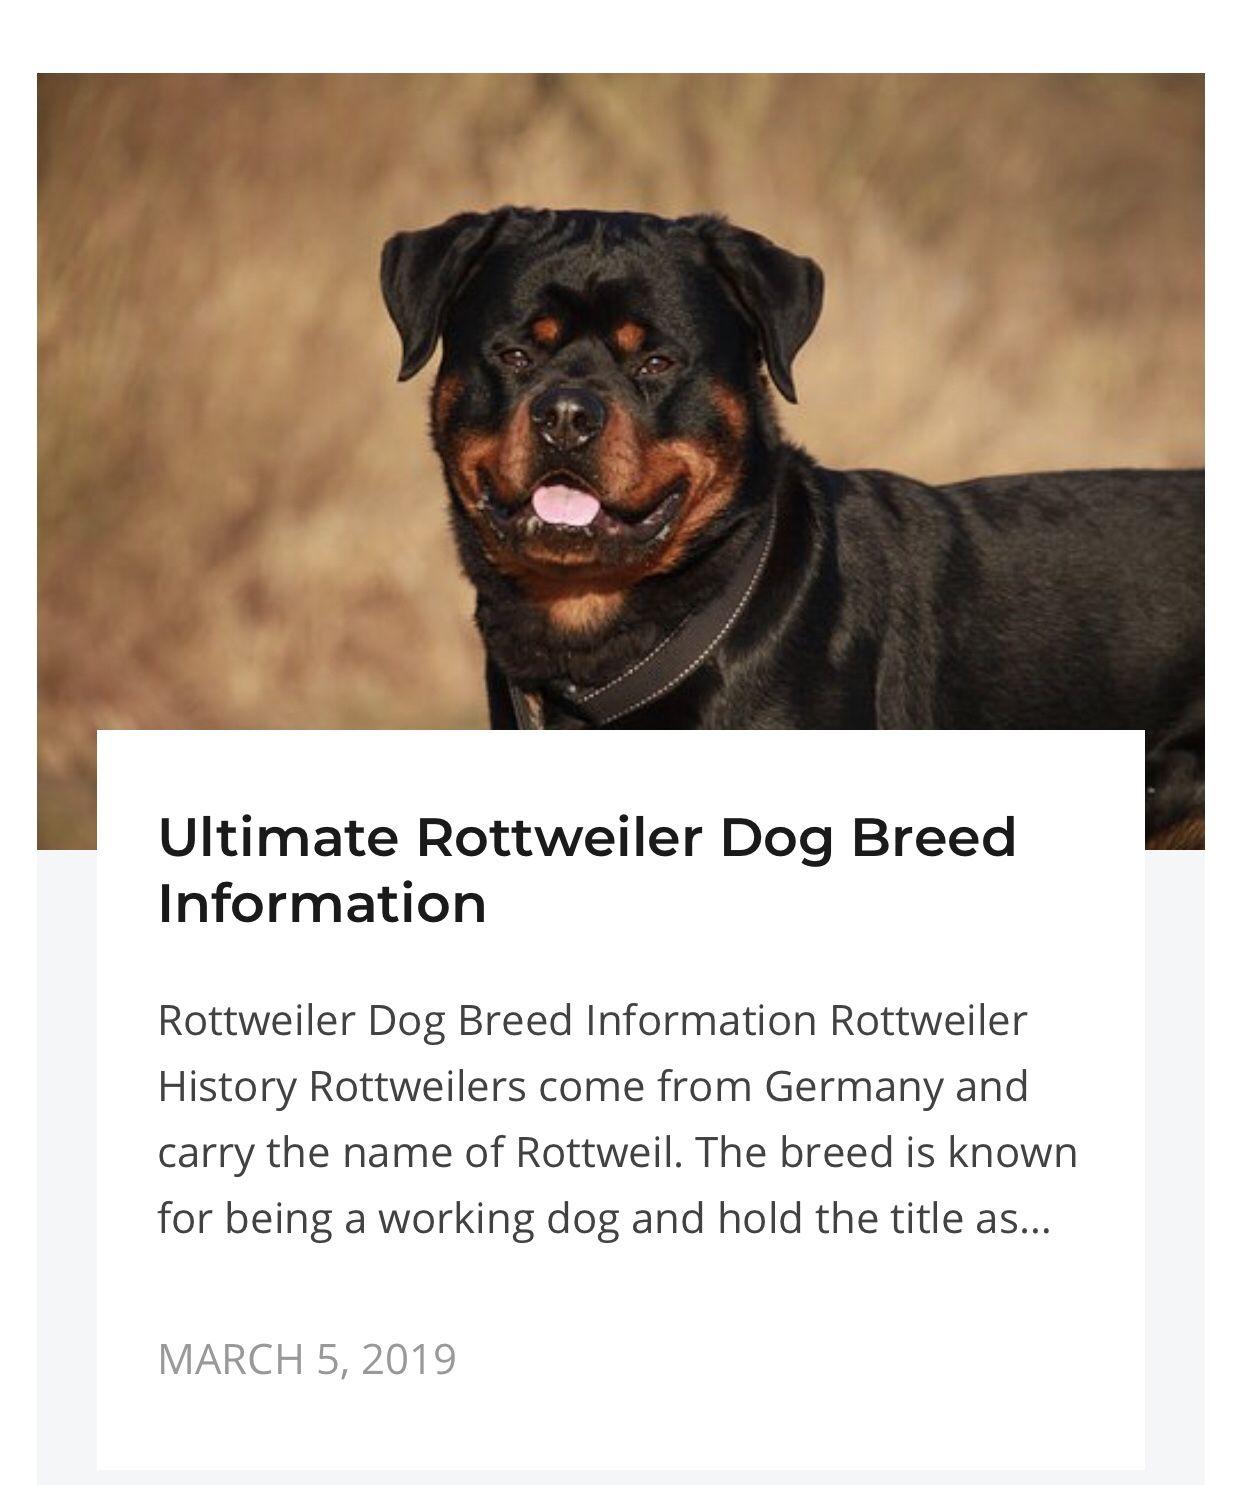 Ultimate Rottweiler Dog Breed Information Rottweiler Dog Breed Rottweiler Dog Rottweiler